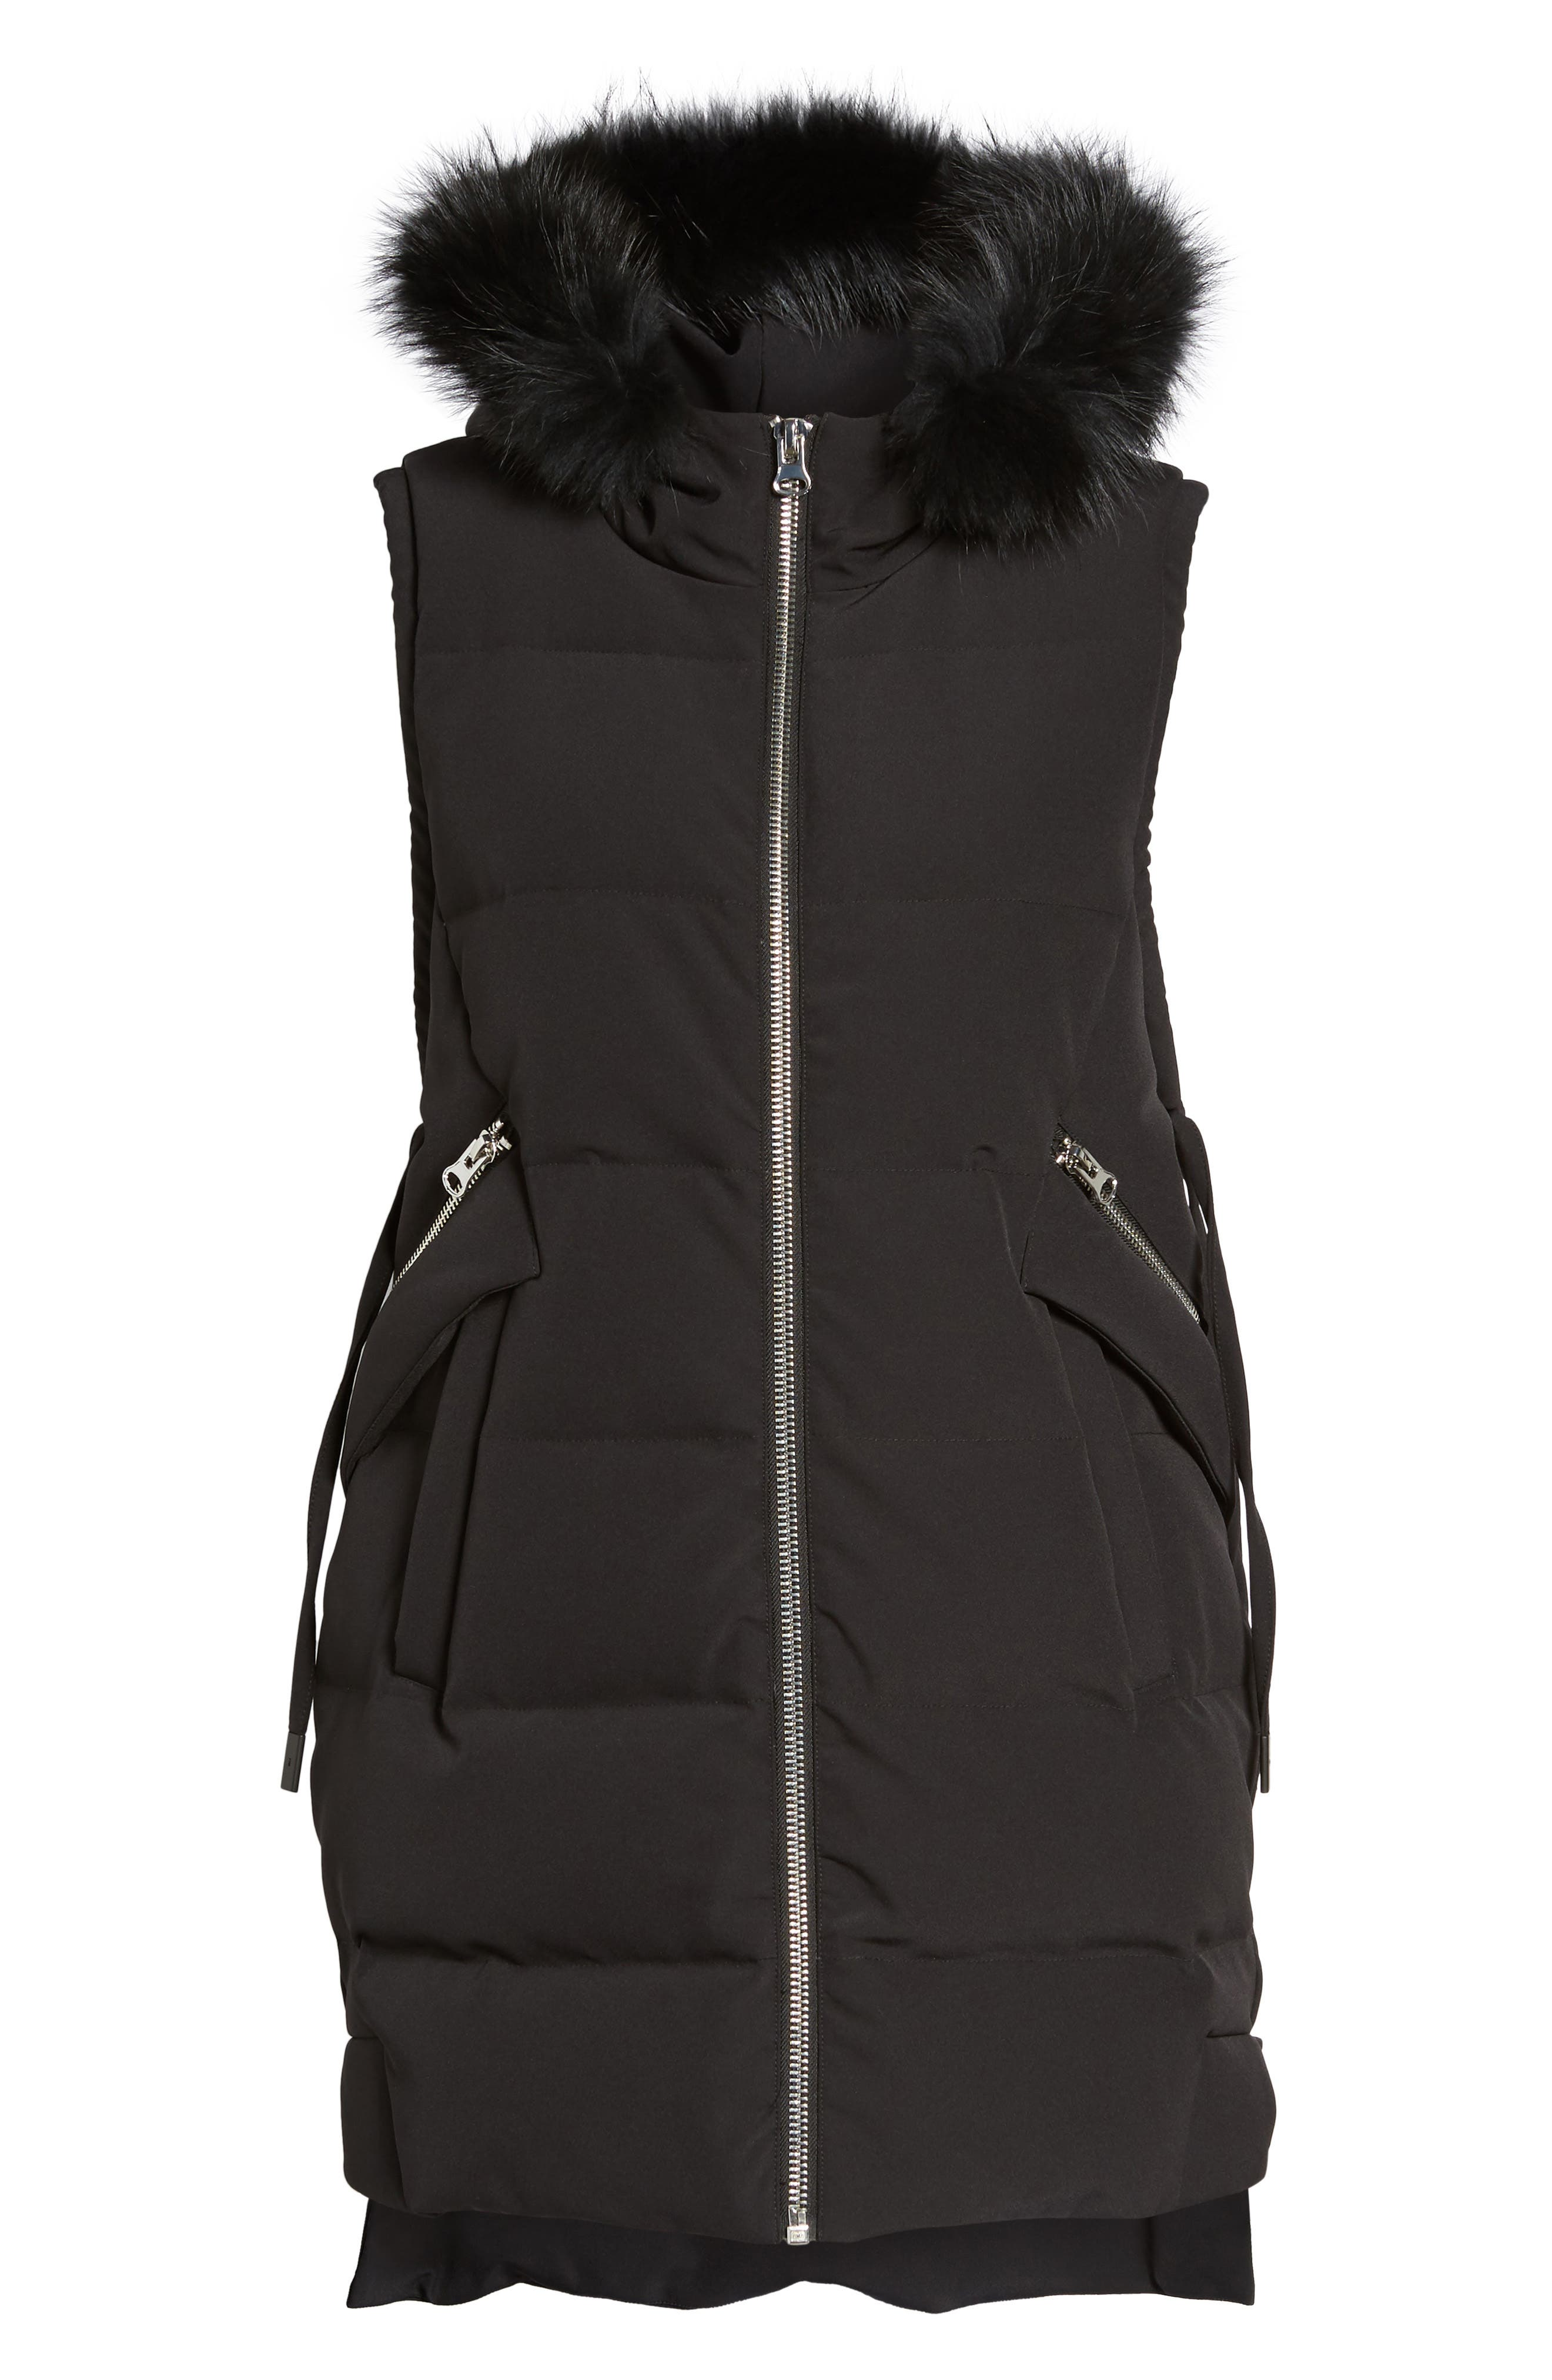 Down Vest with Genuine Fox Fur,                             Alternate thumbnail 5, color,                             001